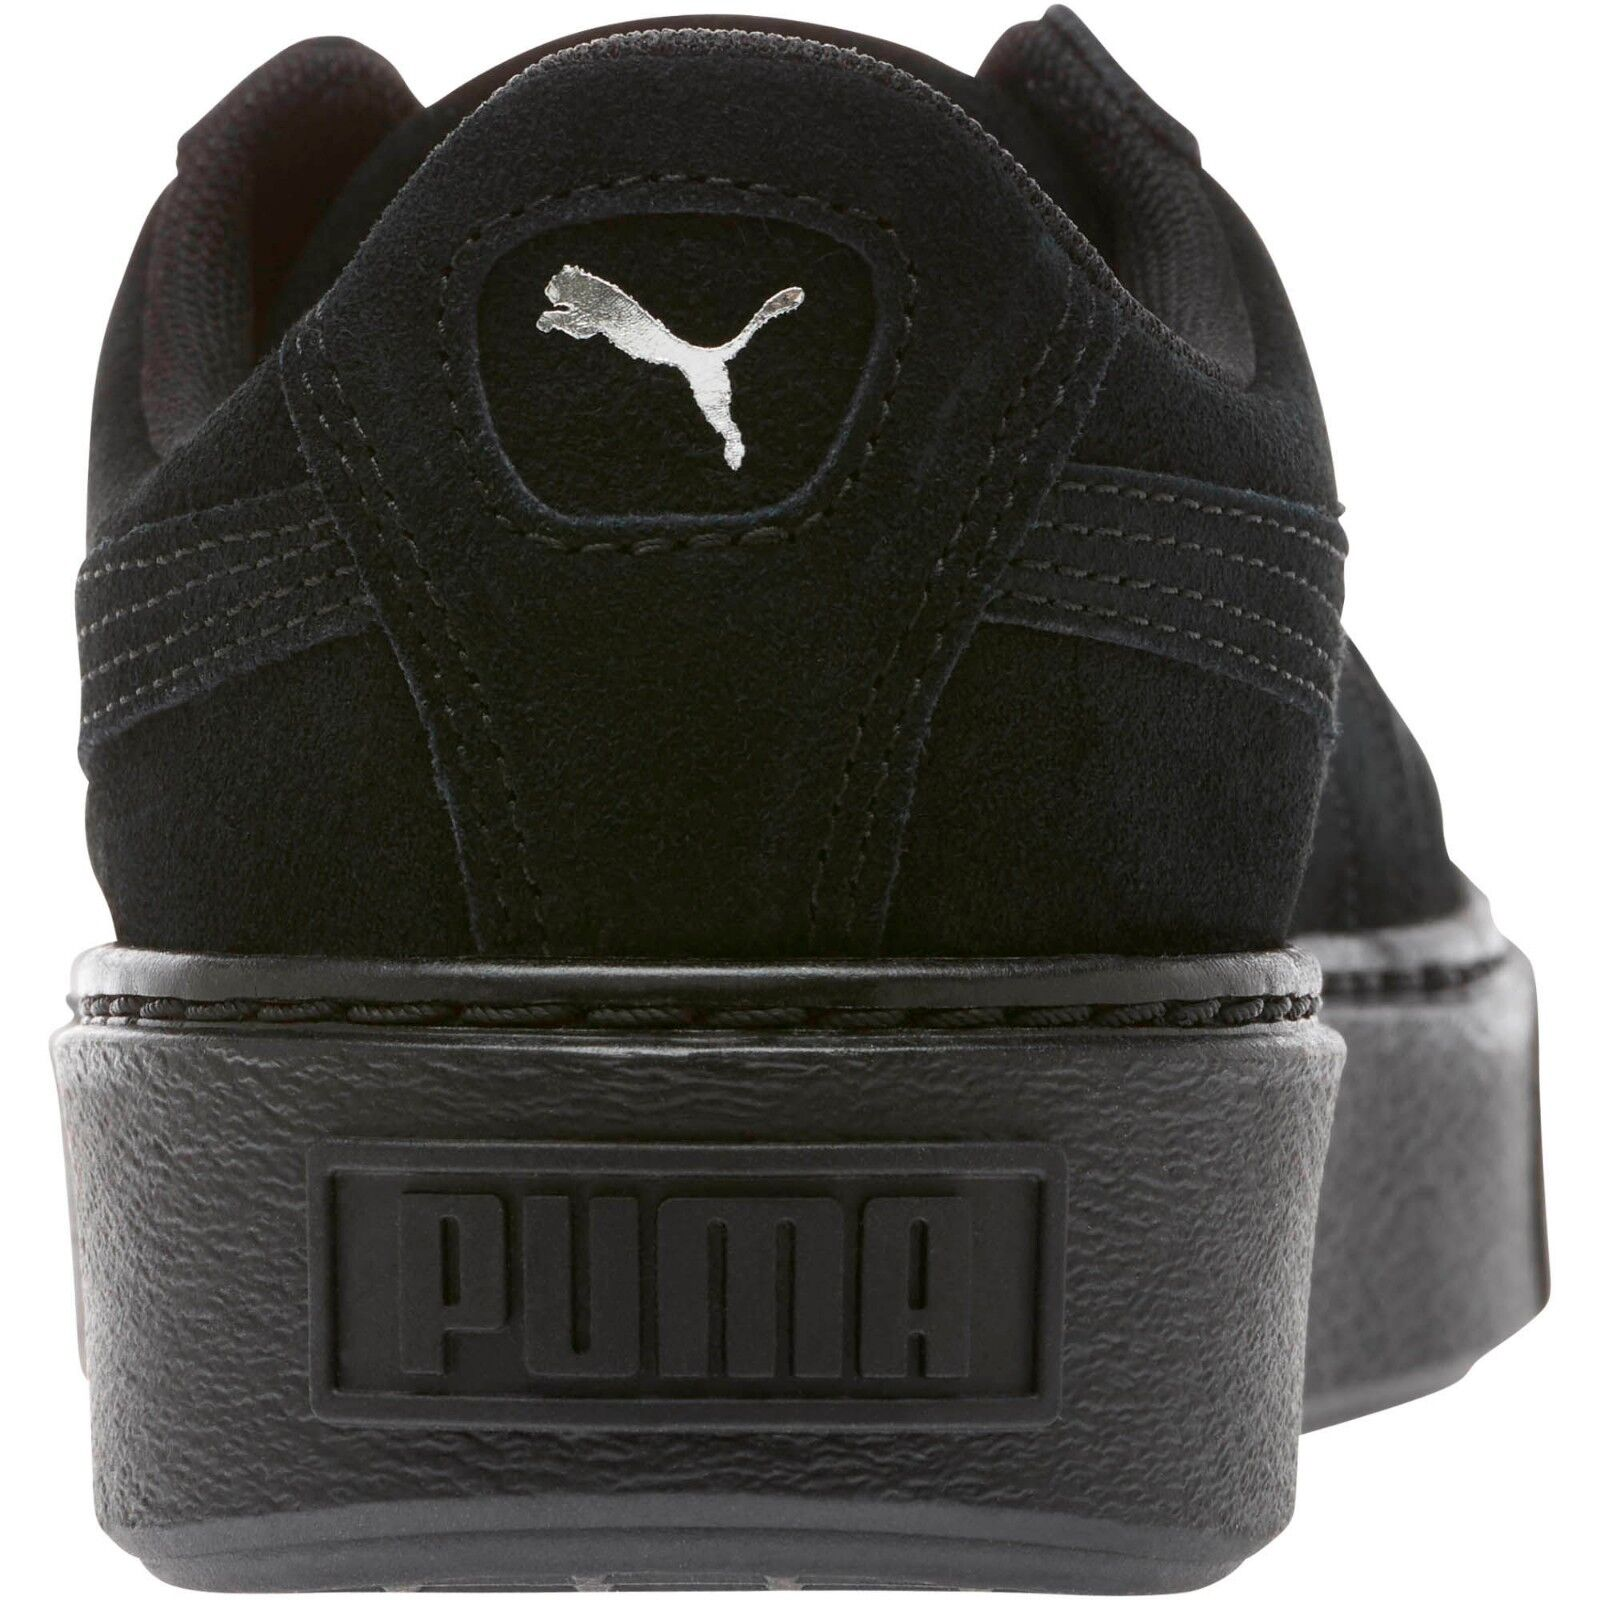 Puma Donna  SUEDE SUEDE SUEDE PLATFORM CRUSHED GEM scarpe nero 365866-01 b 11afbb